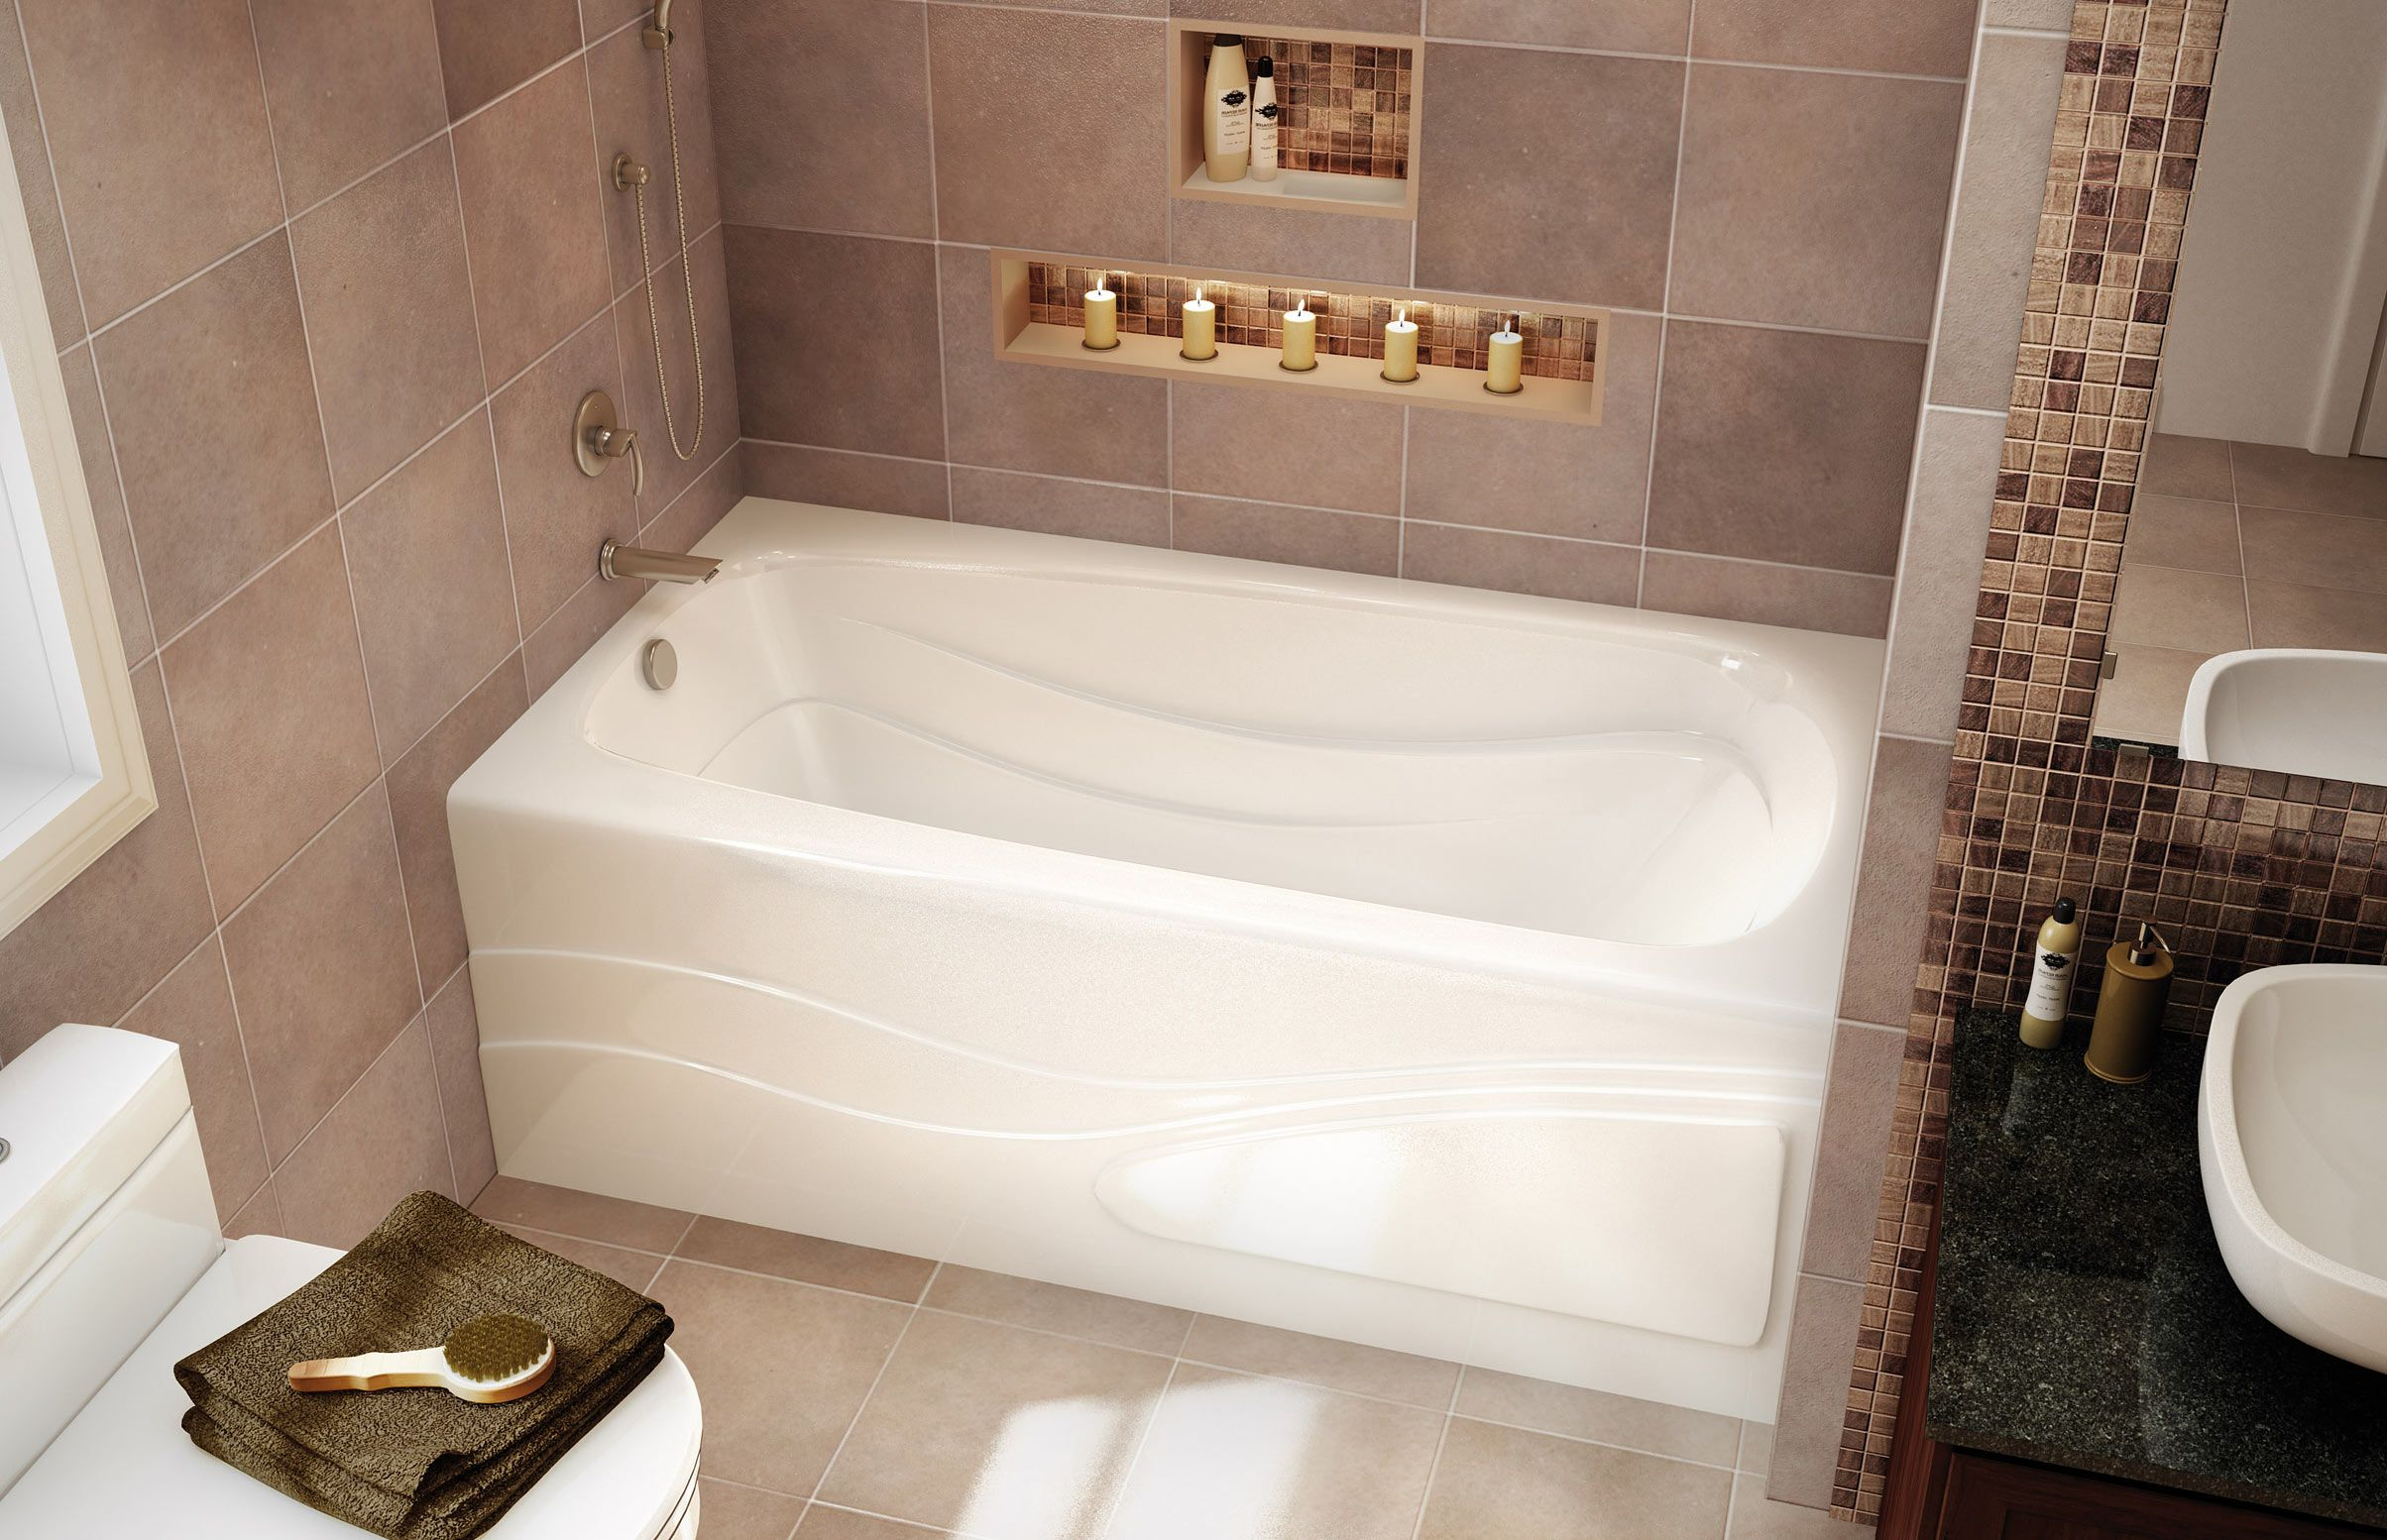 TENDERNESS Alcove bathtub - MAAX Professional | Bathroom remodel ...